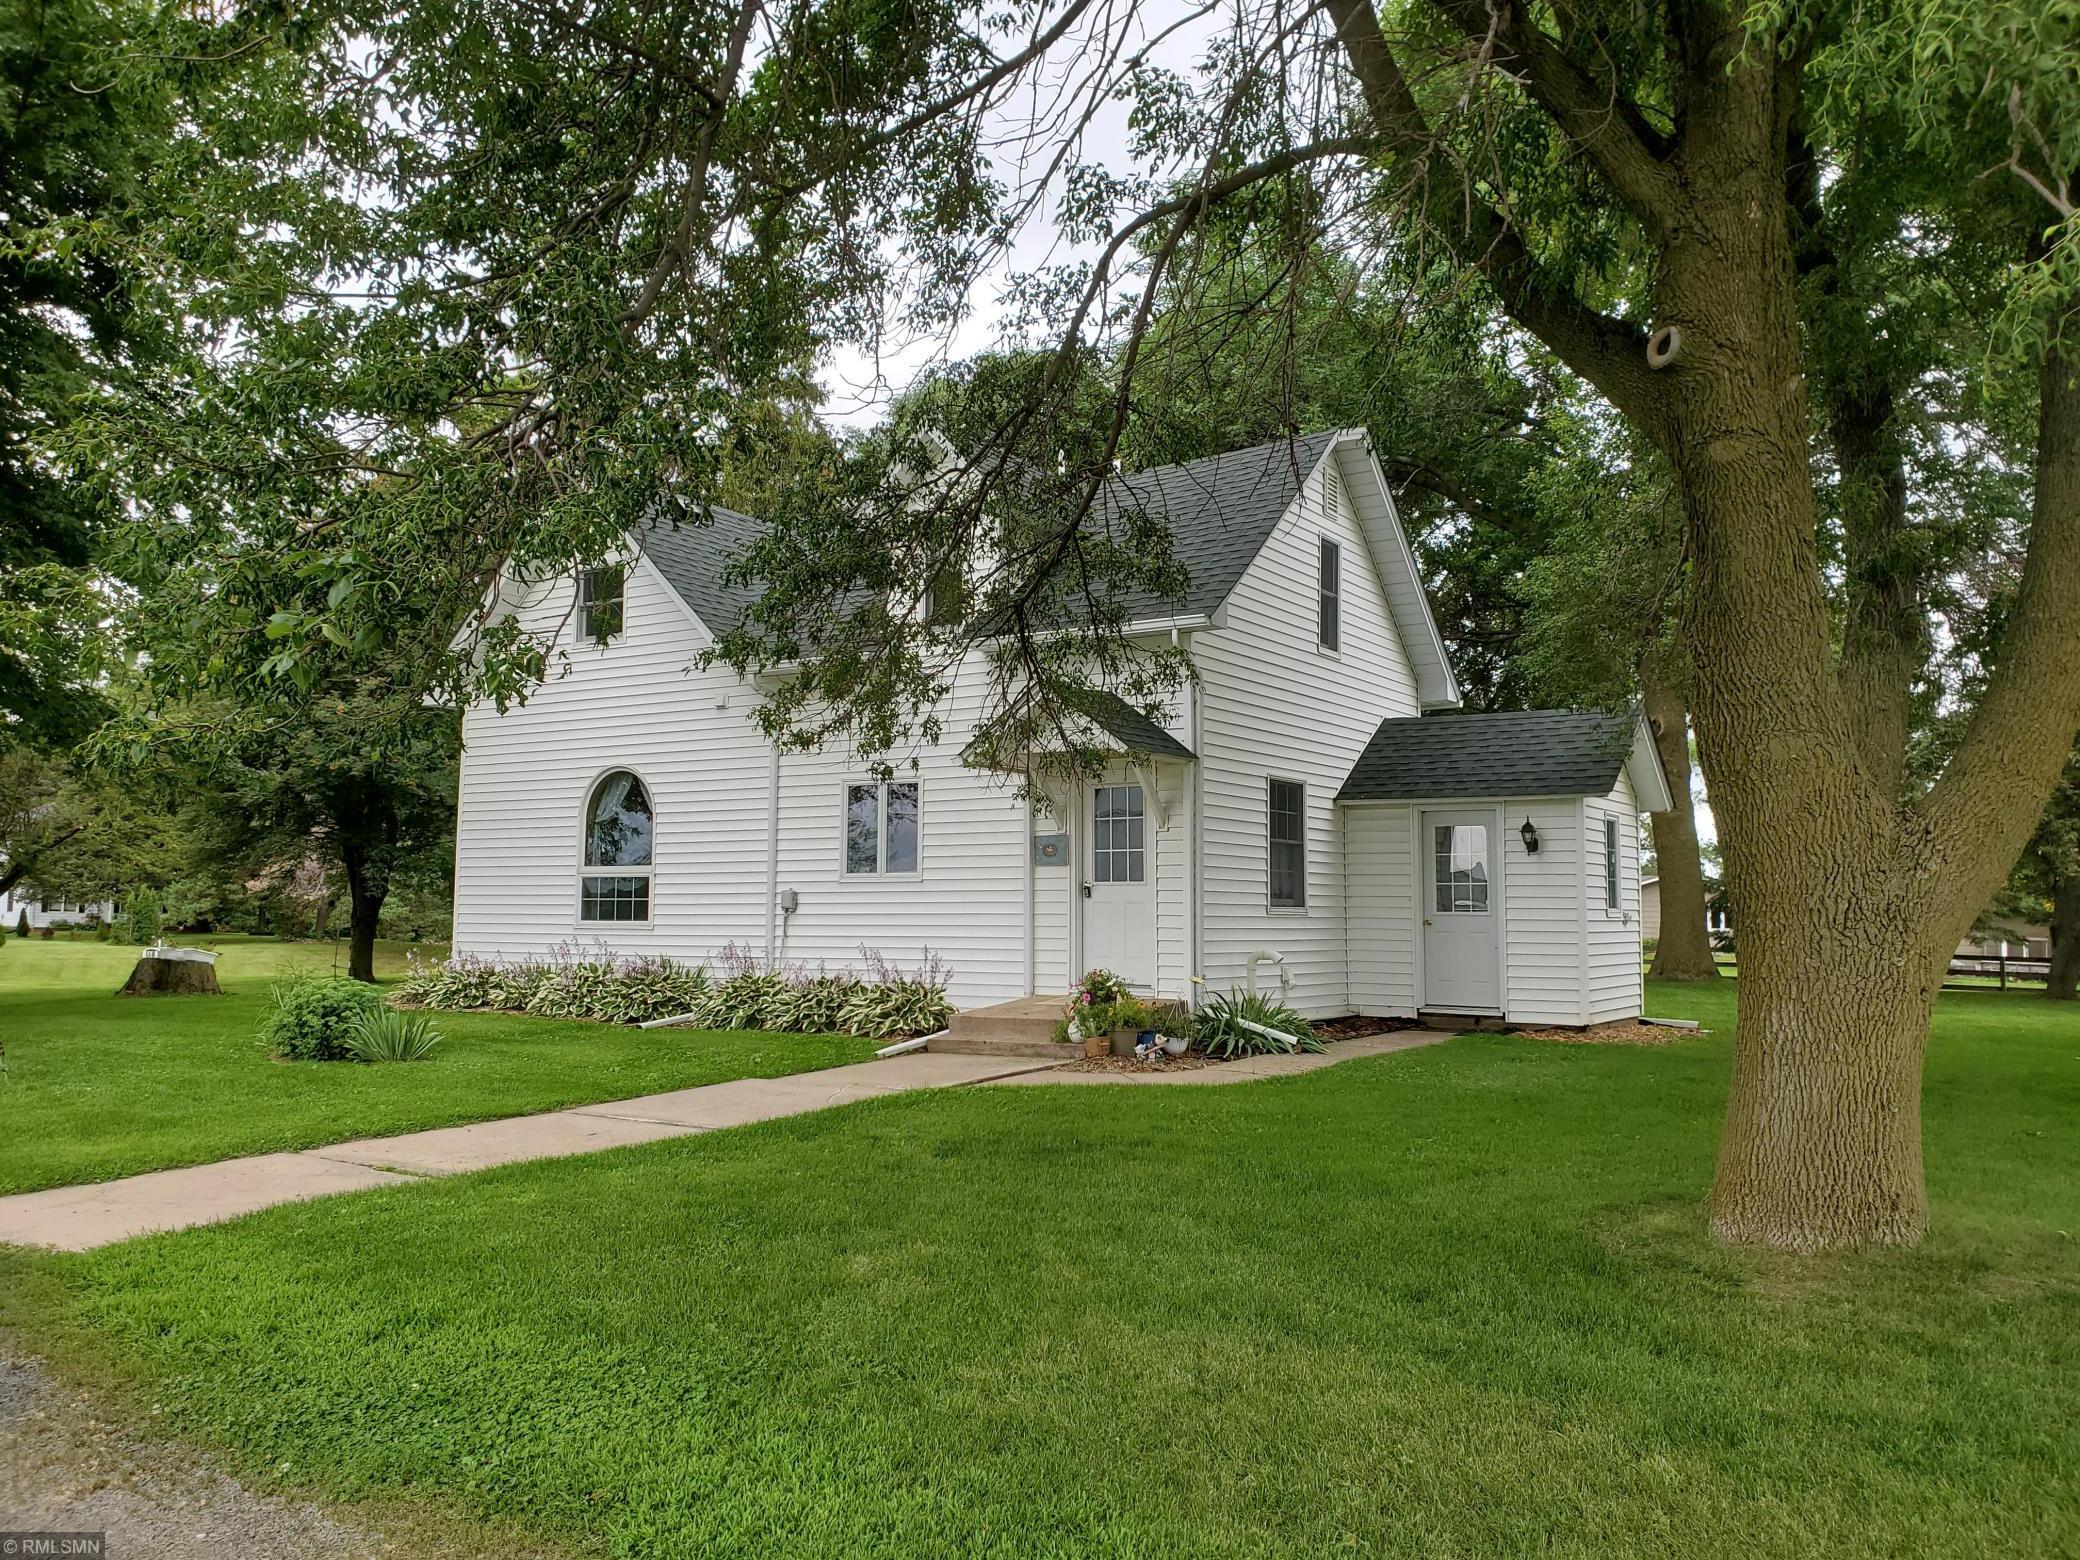 212 State Road 35 Property Photo - Farmington Twp, WI real estate listing